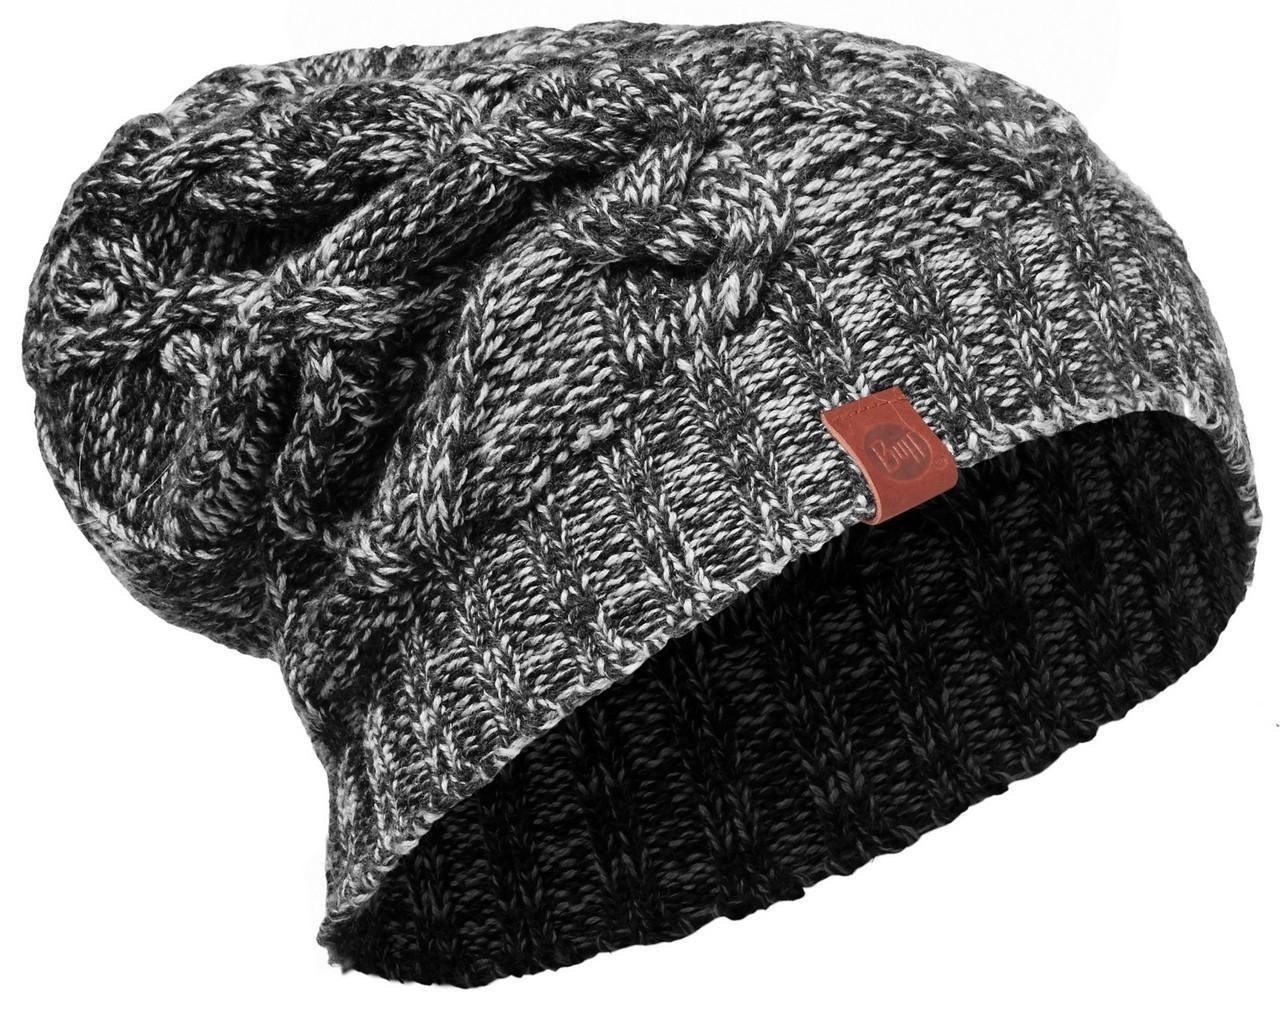 Шапки крупной вязки Вязаная шапка Buff Nuba Graphite 2008.901.10.jpg